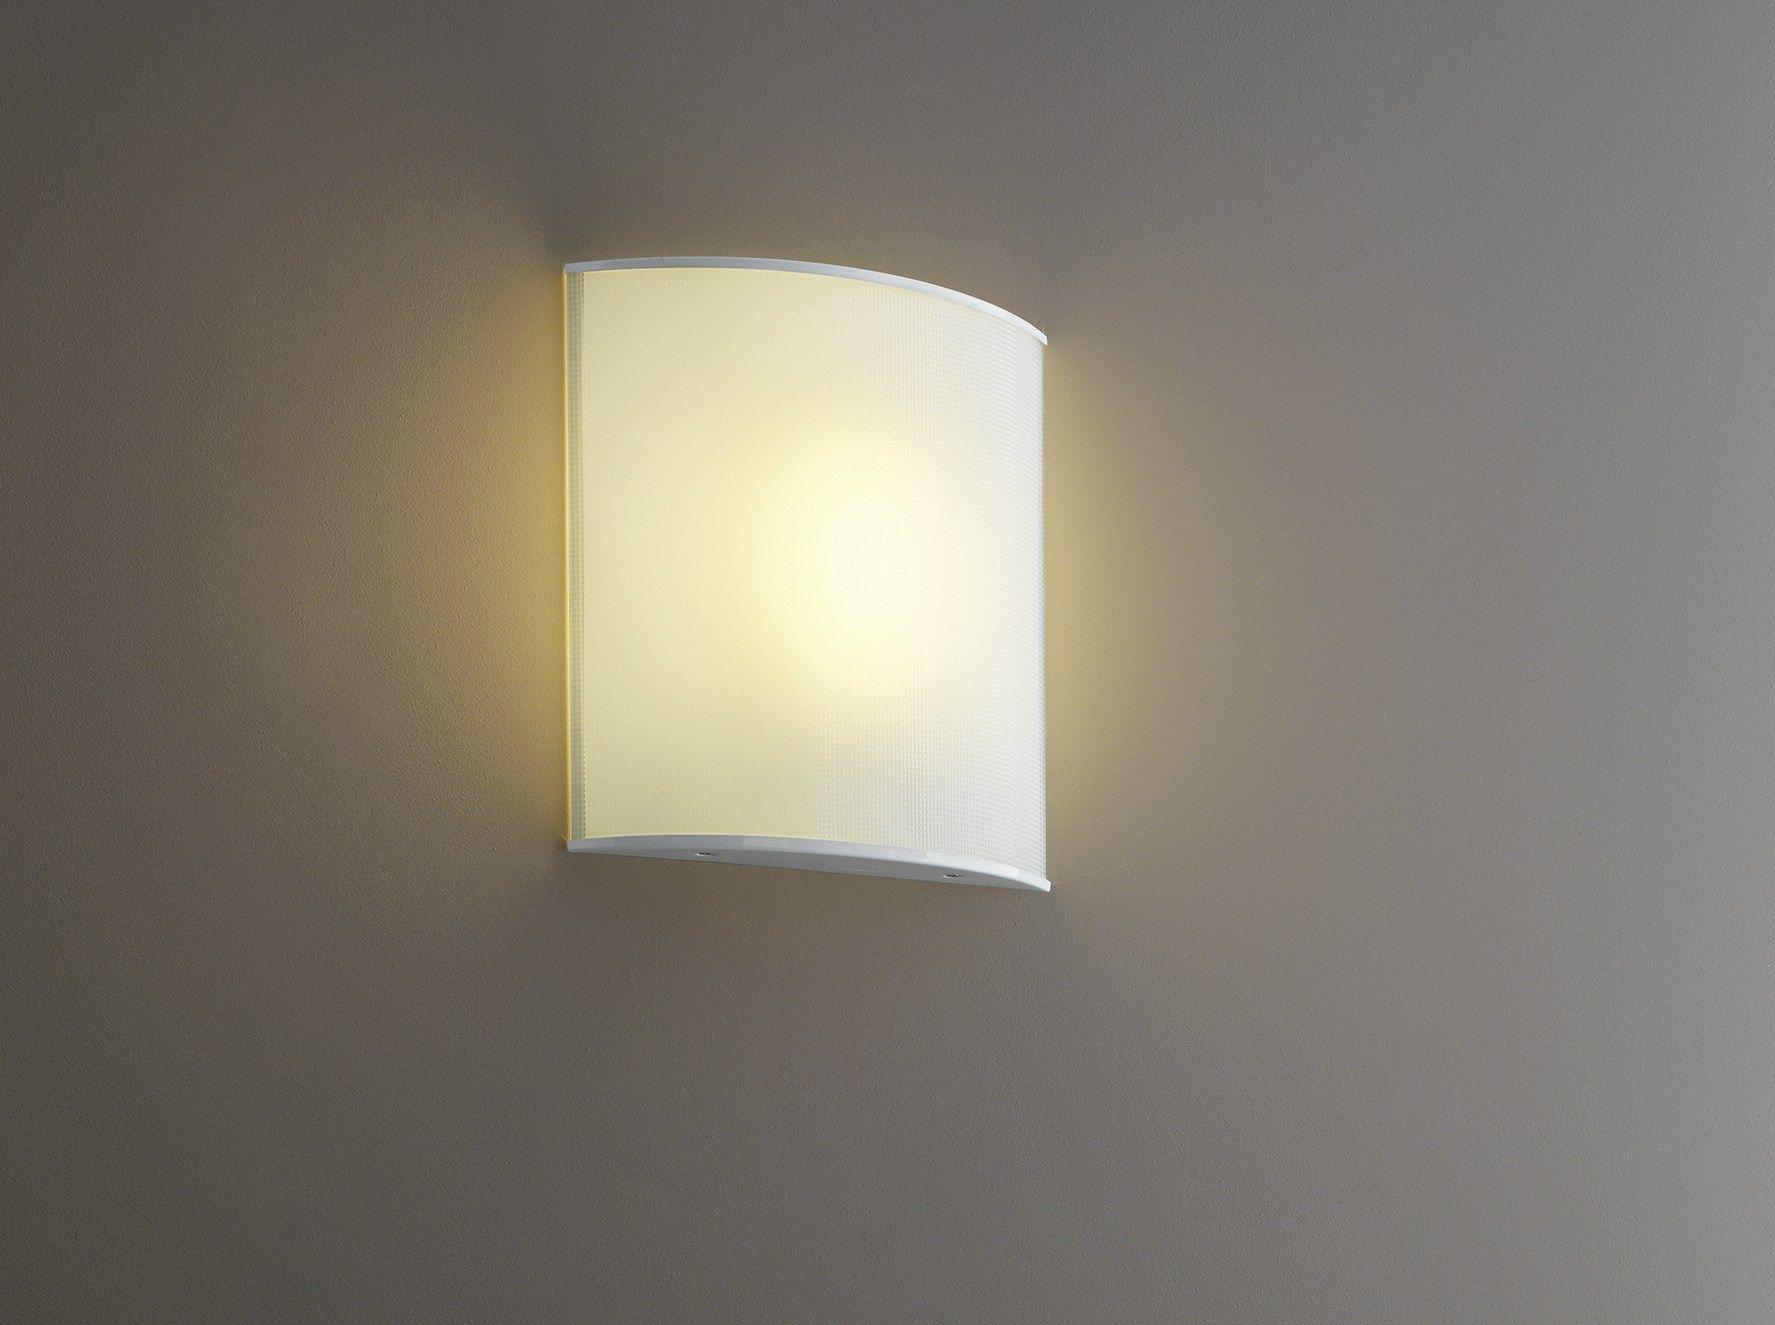 THOR | Wall light By FontanaArte design Angelo Perversi, Luciano ...